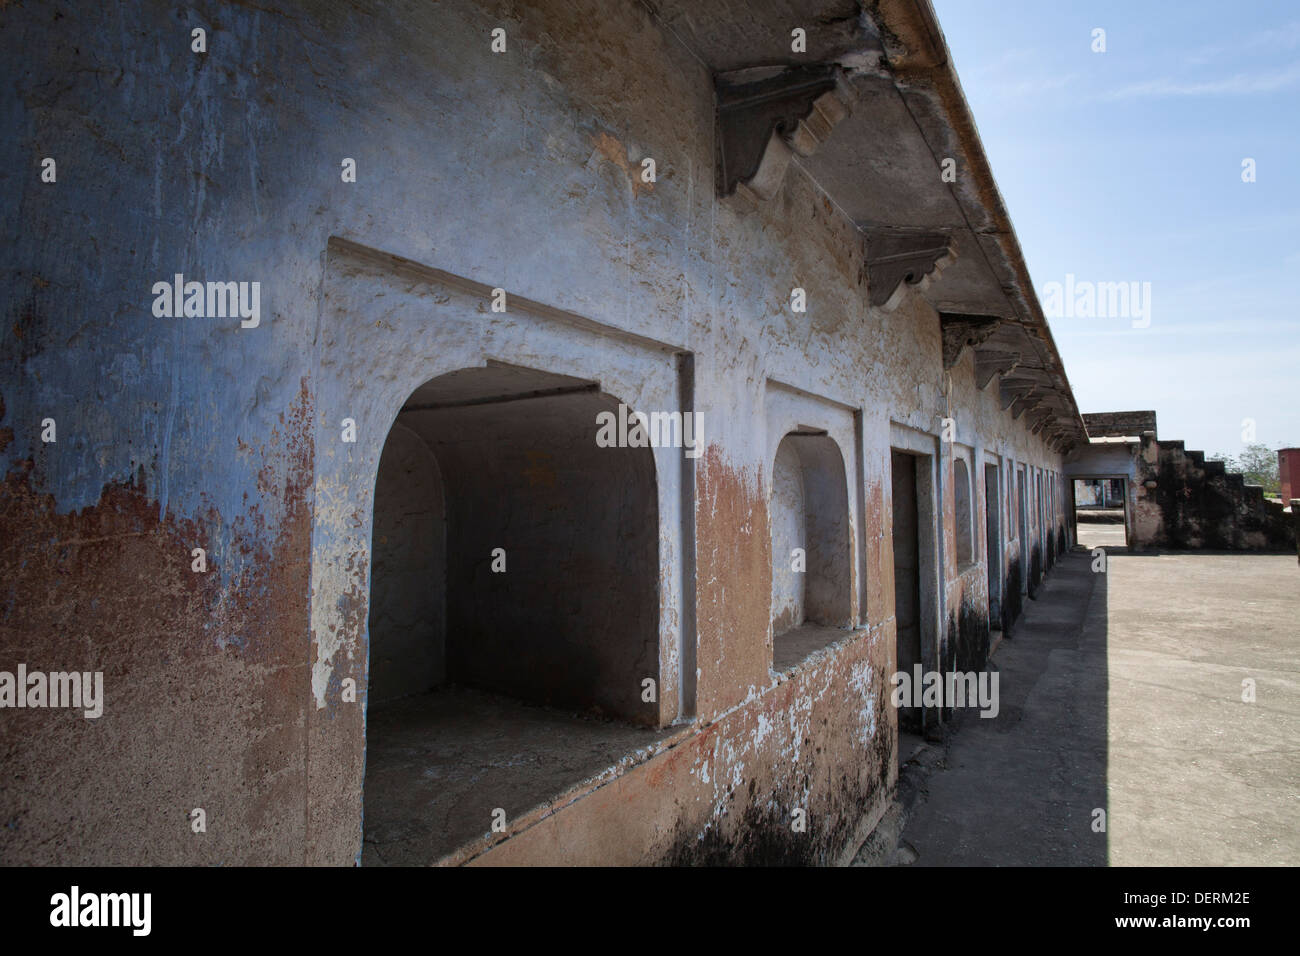 Ruins of a fort, Bhadra Fort, Ahmedabad, Gujarat, India - Stock Image